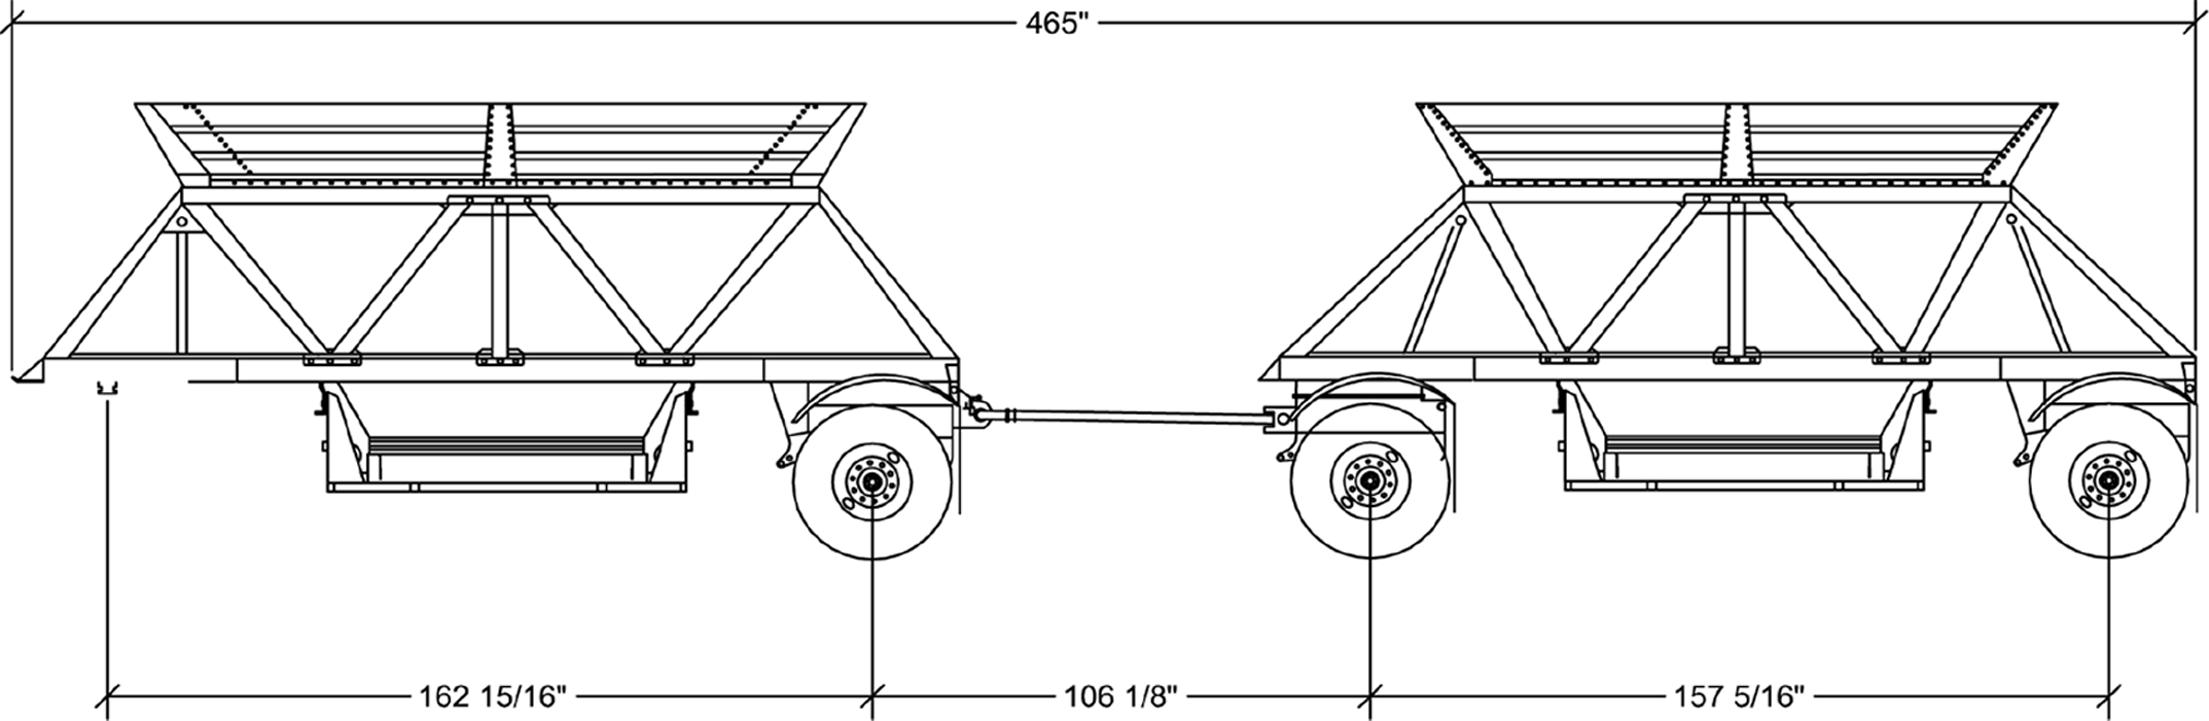 Ranco Steel Mini Bottom Dump Trailer Drawing